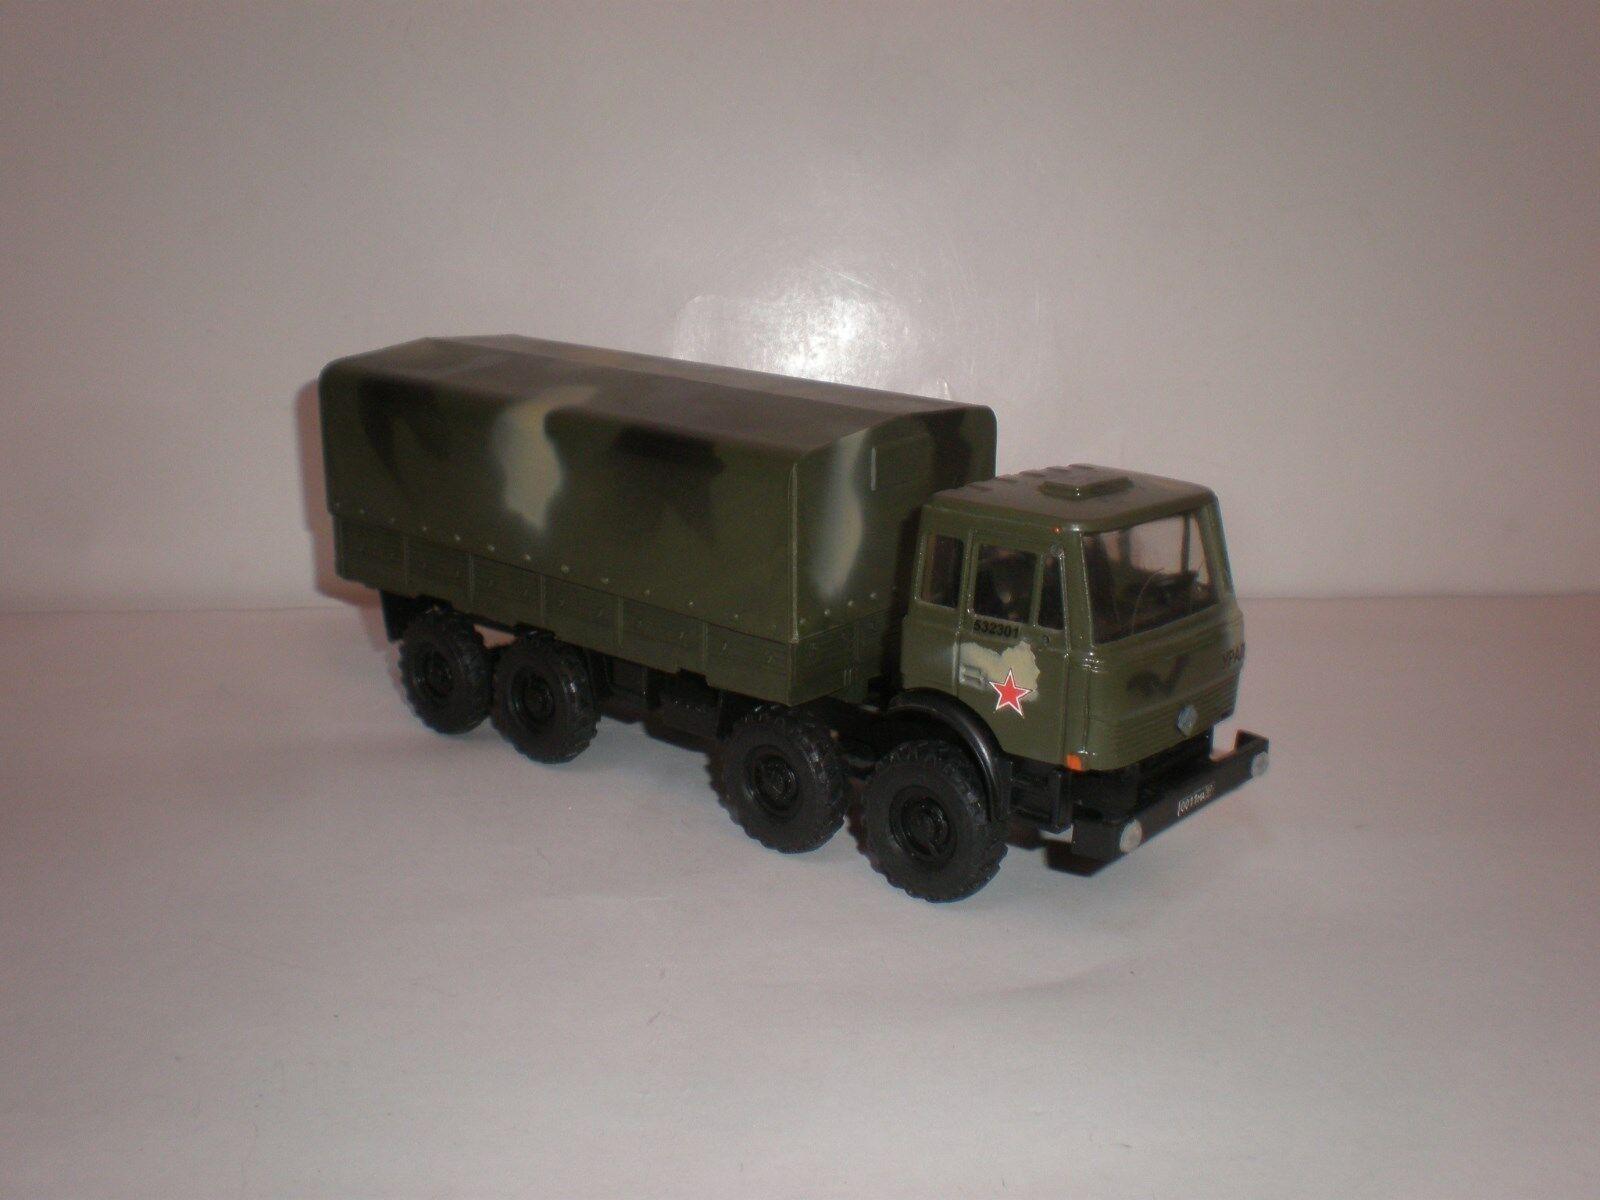 1/43 camión militar rusa Ural 532301